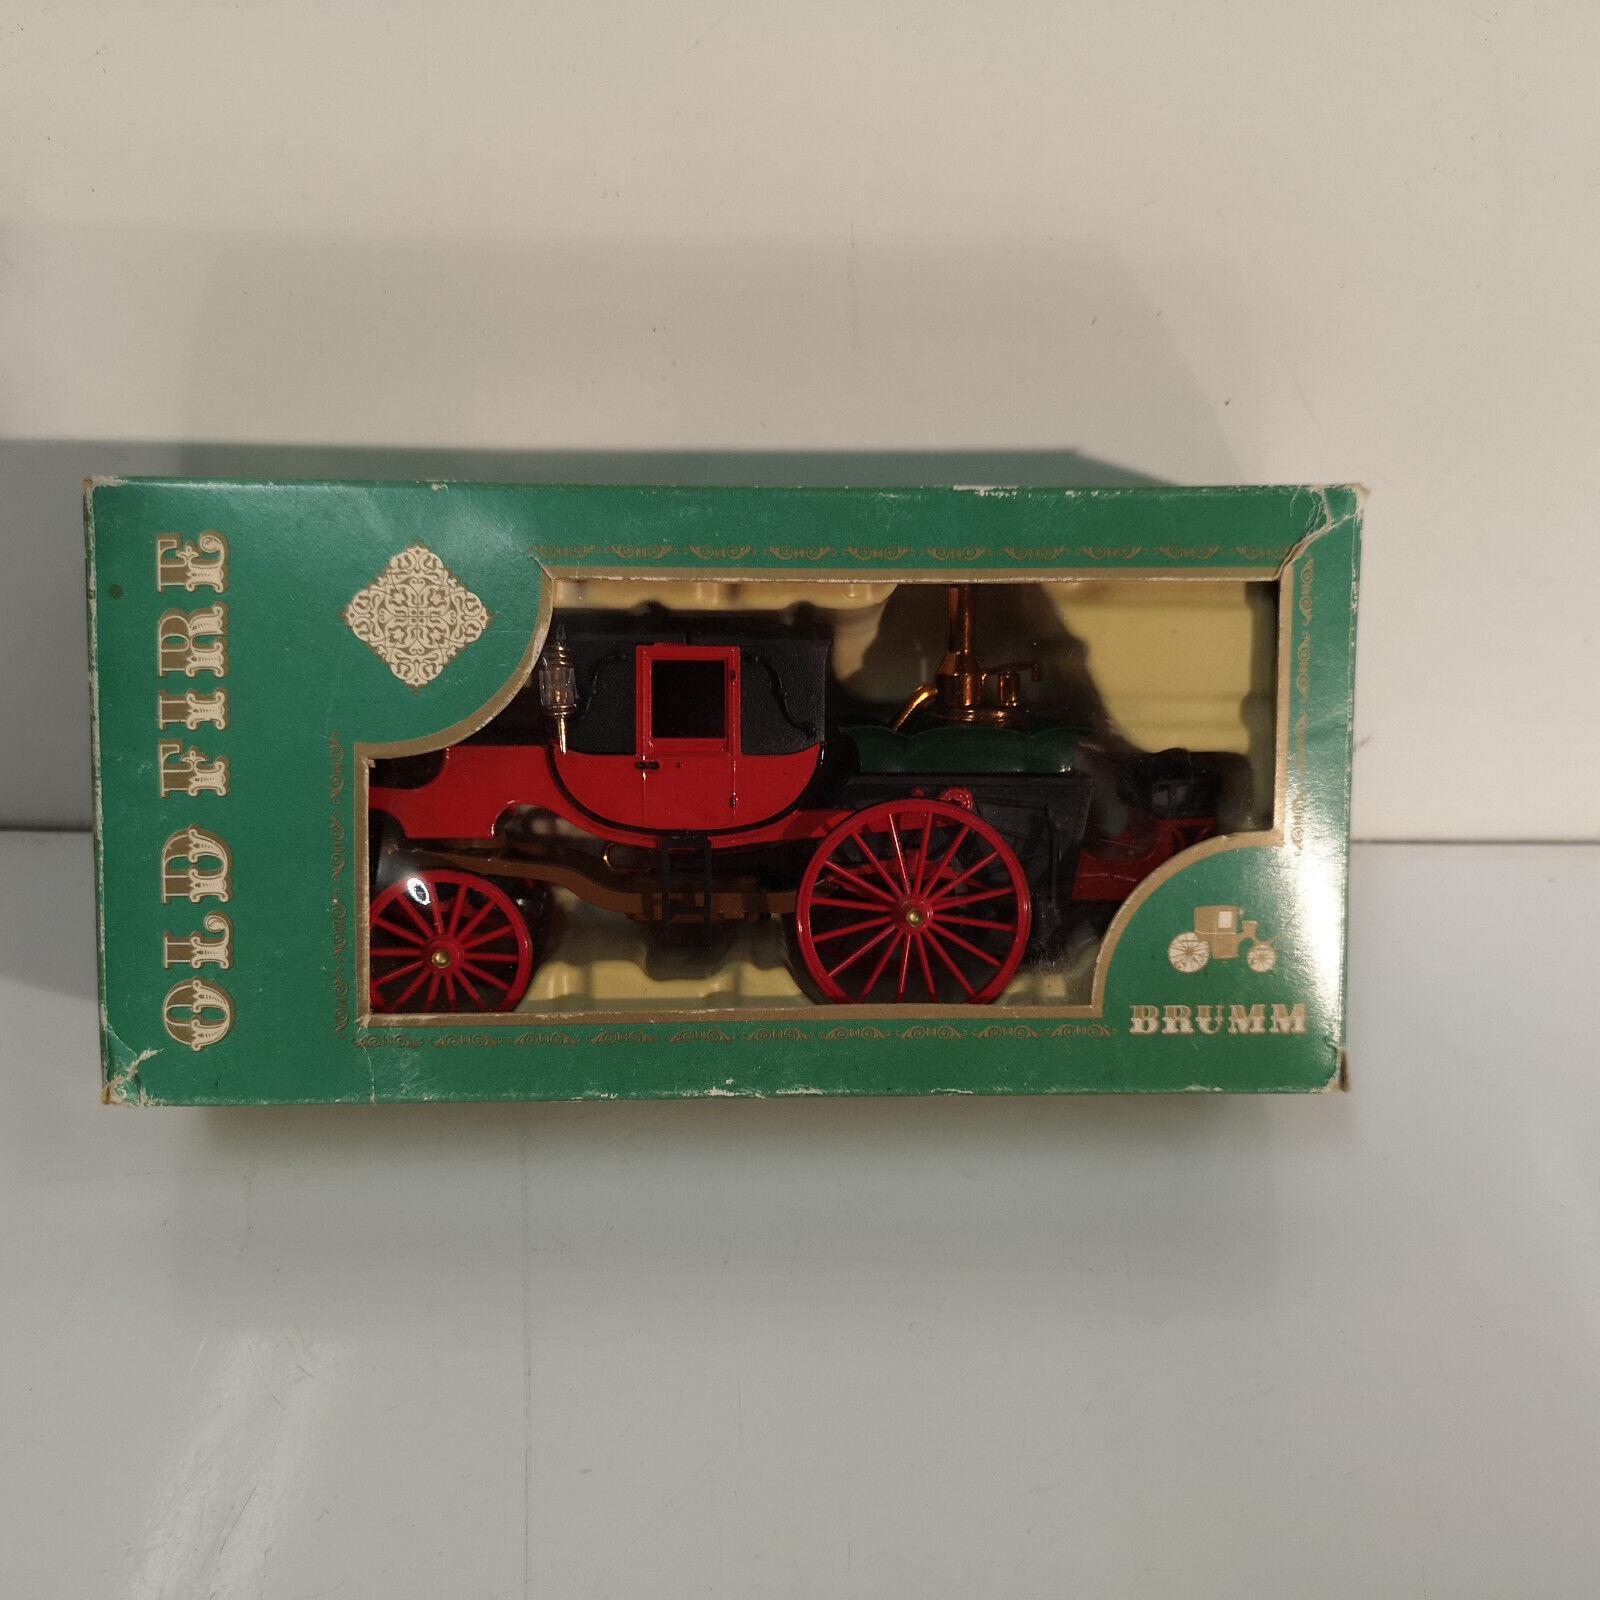 BRUMM SERIE OLD FIRE X5 1854 CARRO A VAPORE Di BORDINO Made in1976 SCALE 1 43